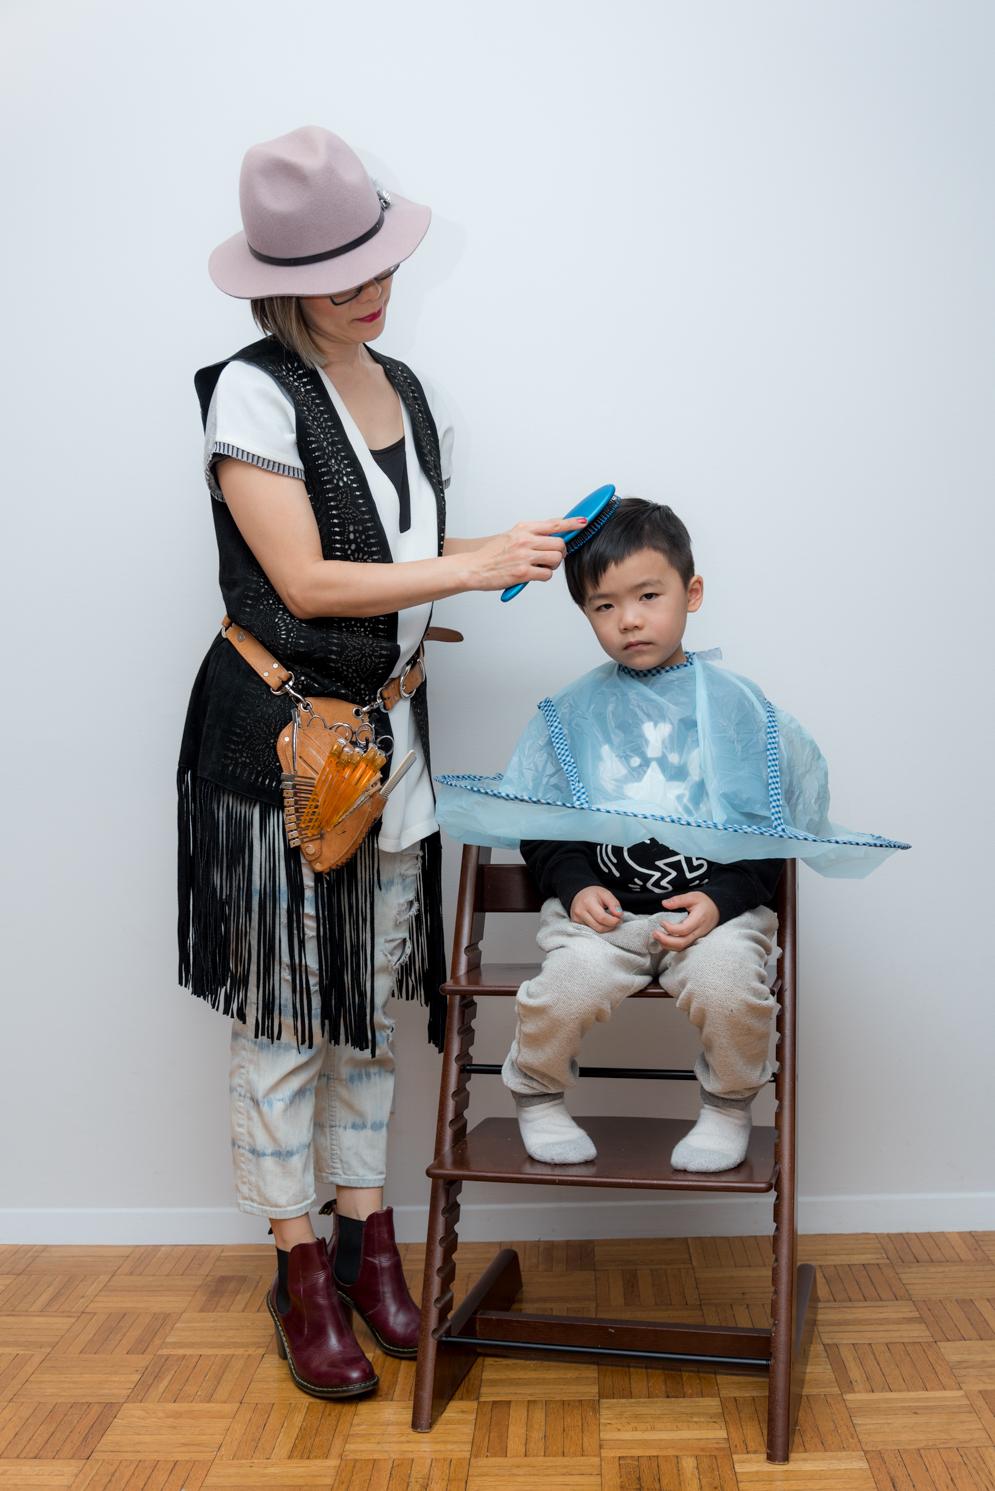 Rock mama nyc lifestyle blog - good tools for a kids haircut at home